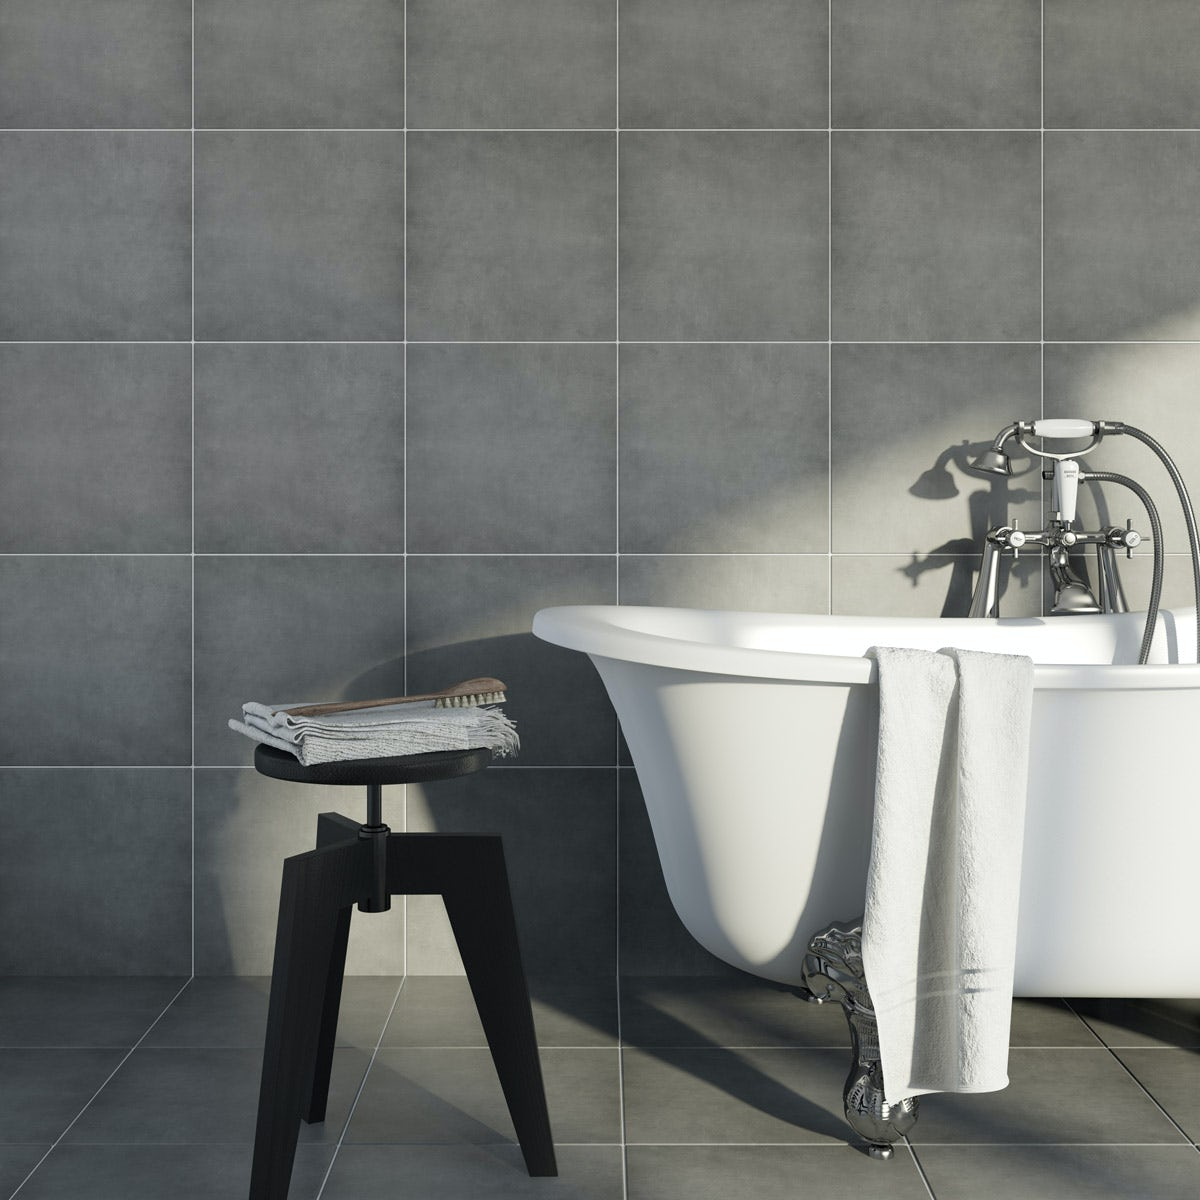 British Ceramic Tile Victoriana Feature plain grey matt floor tile 331mm x 331mm